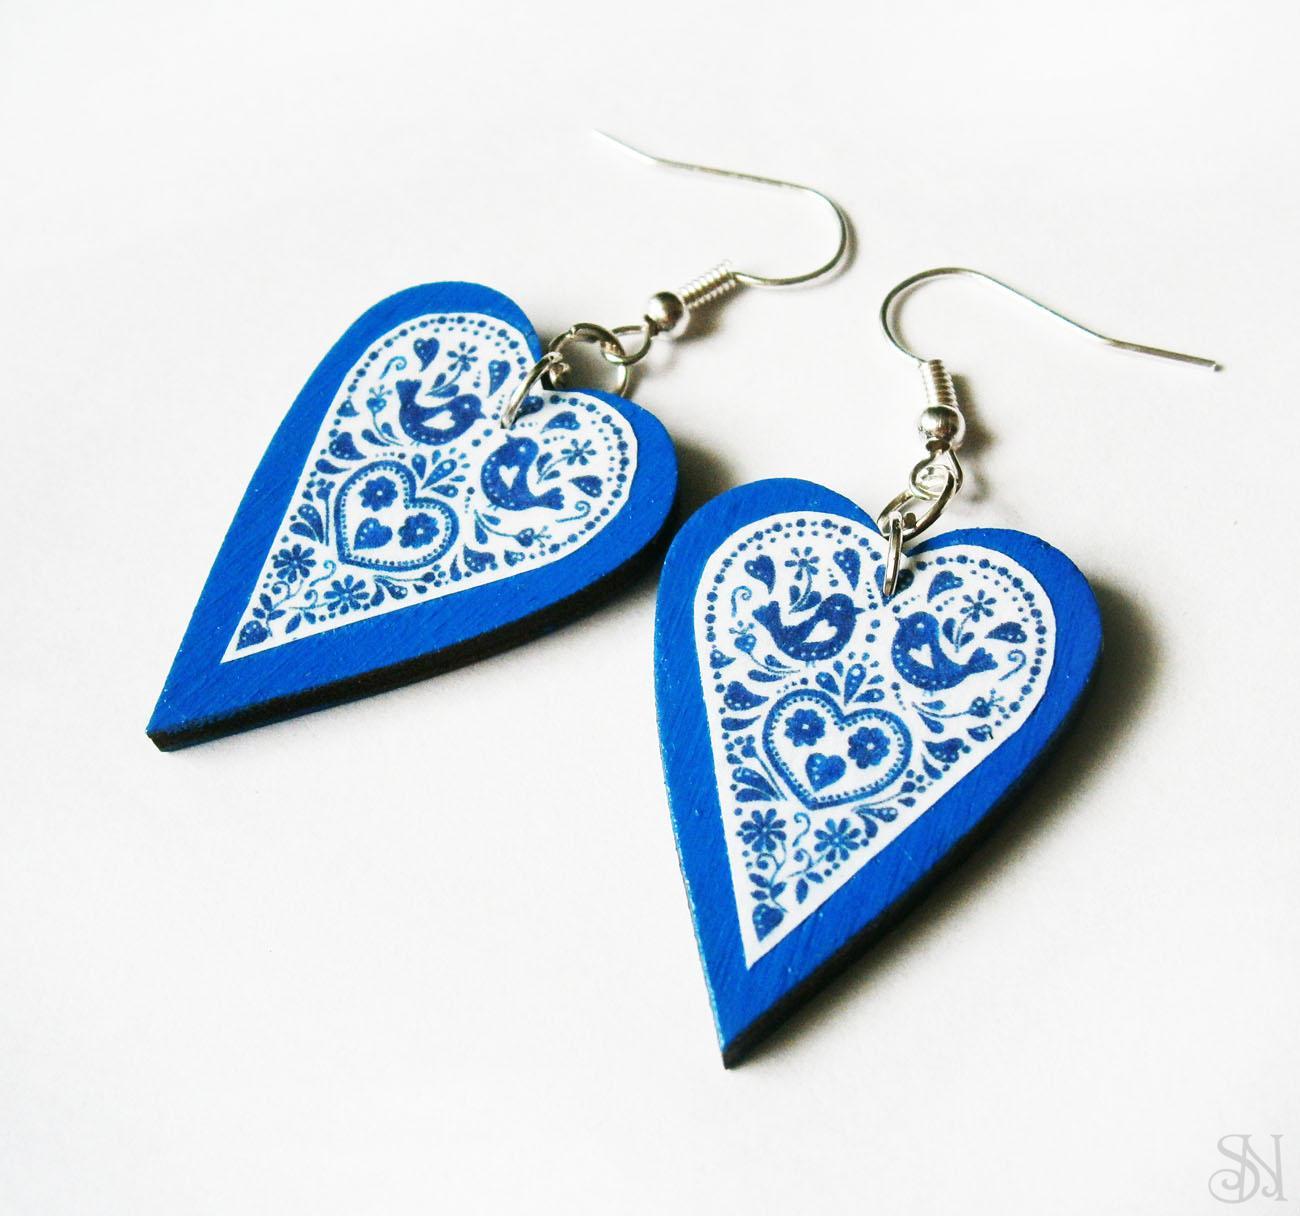 Modré folklórne srdiečkové náušnice s modrým okrajom ac2e5c6ddbe